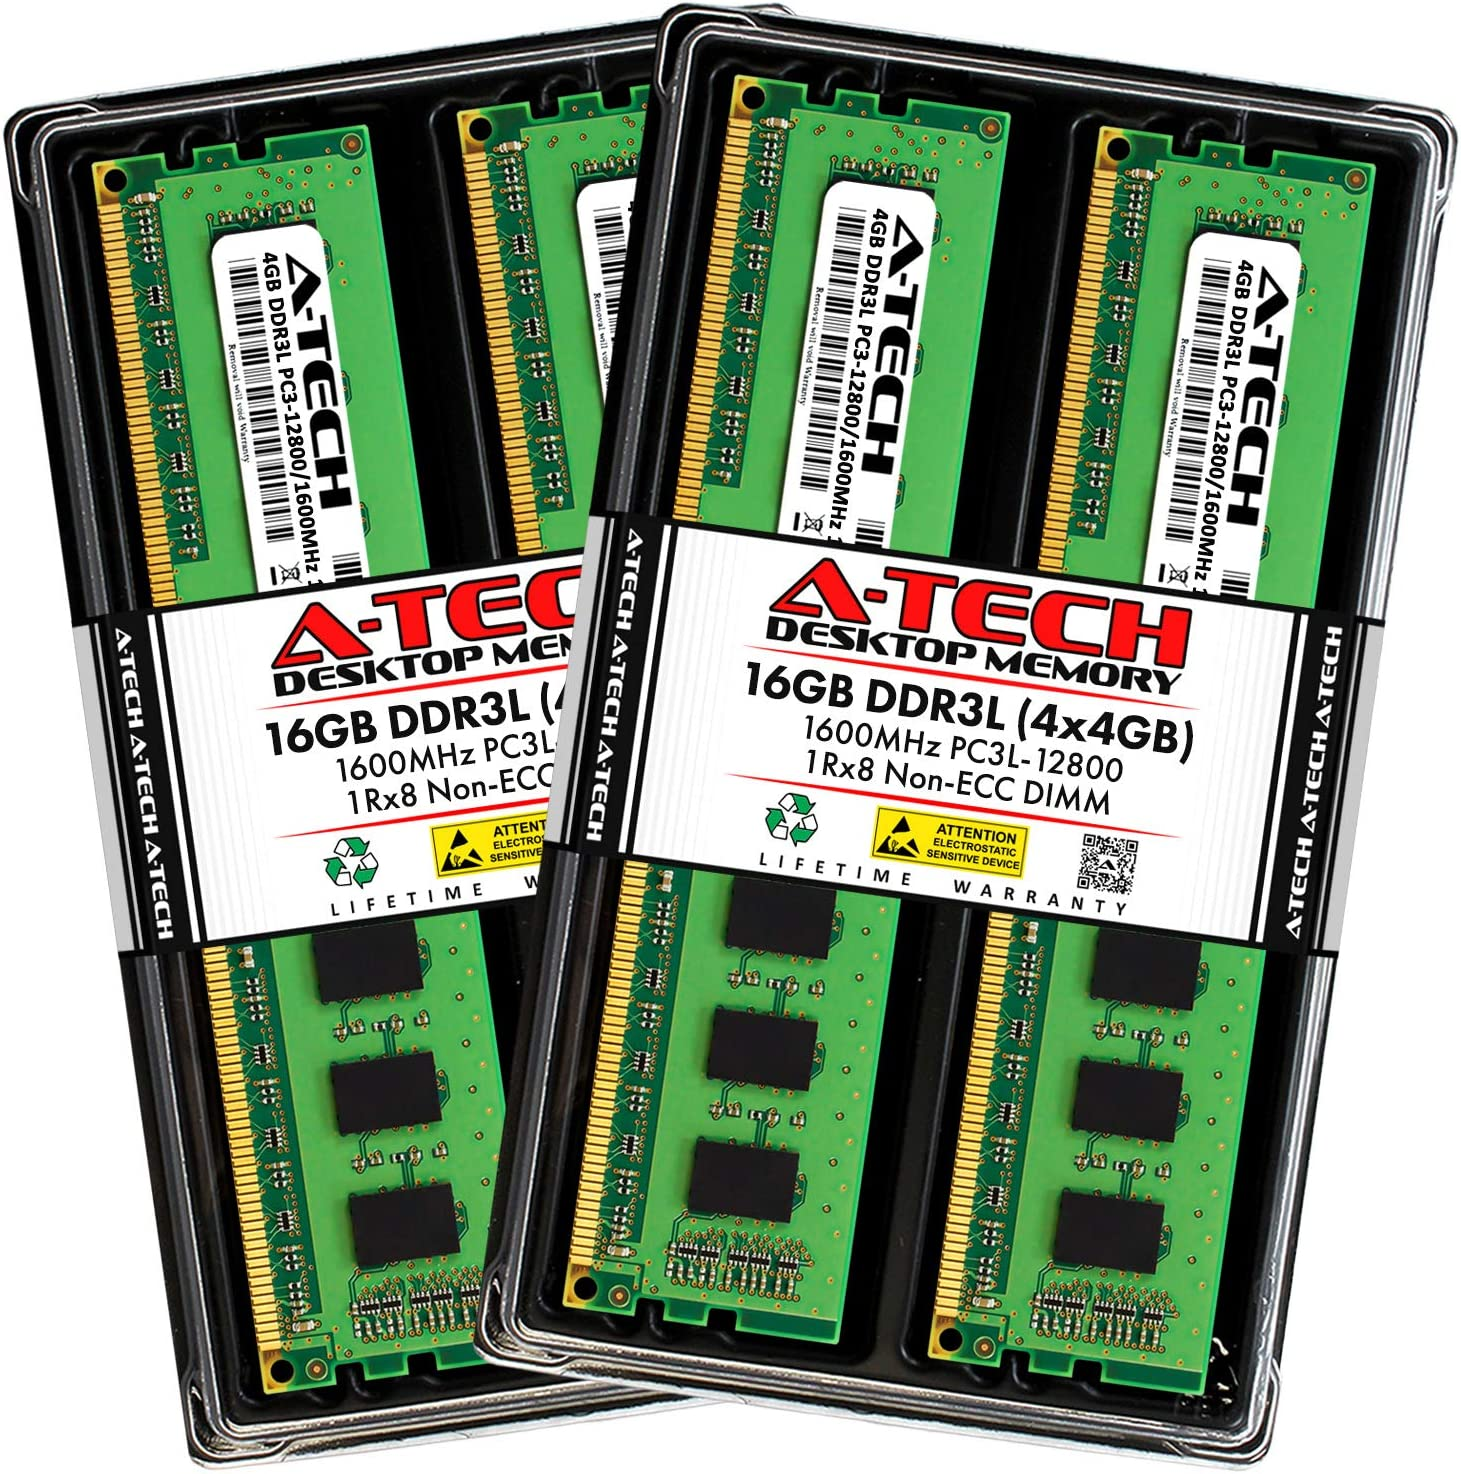 A-Tech 16GB DDR3 / DDR3L 1600MHz Desktop Memory Kit (4 x 4GB) PC3-12800 Non-ECC Unbuffered DIMM 240-Pin 1Rx8 1.35V Low Voltage Single Rank Computer RAM Upgrade Sticks